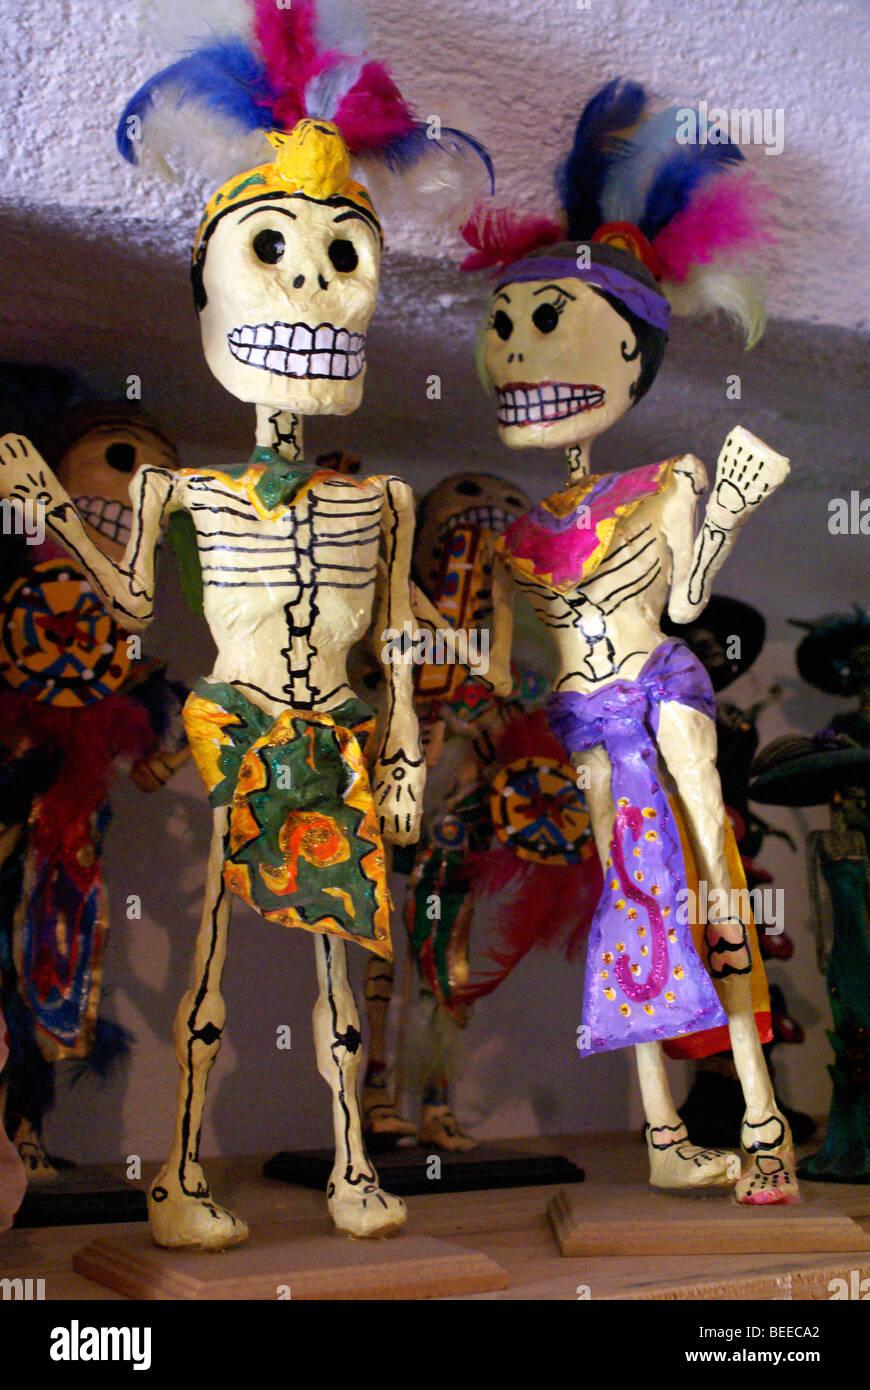 Papier macné Skelette aus Oaxaca zum Verkauf in San Miguel de Allende, Mexiko Stockbild